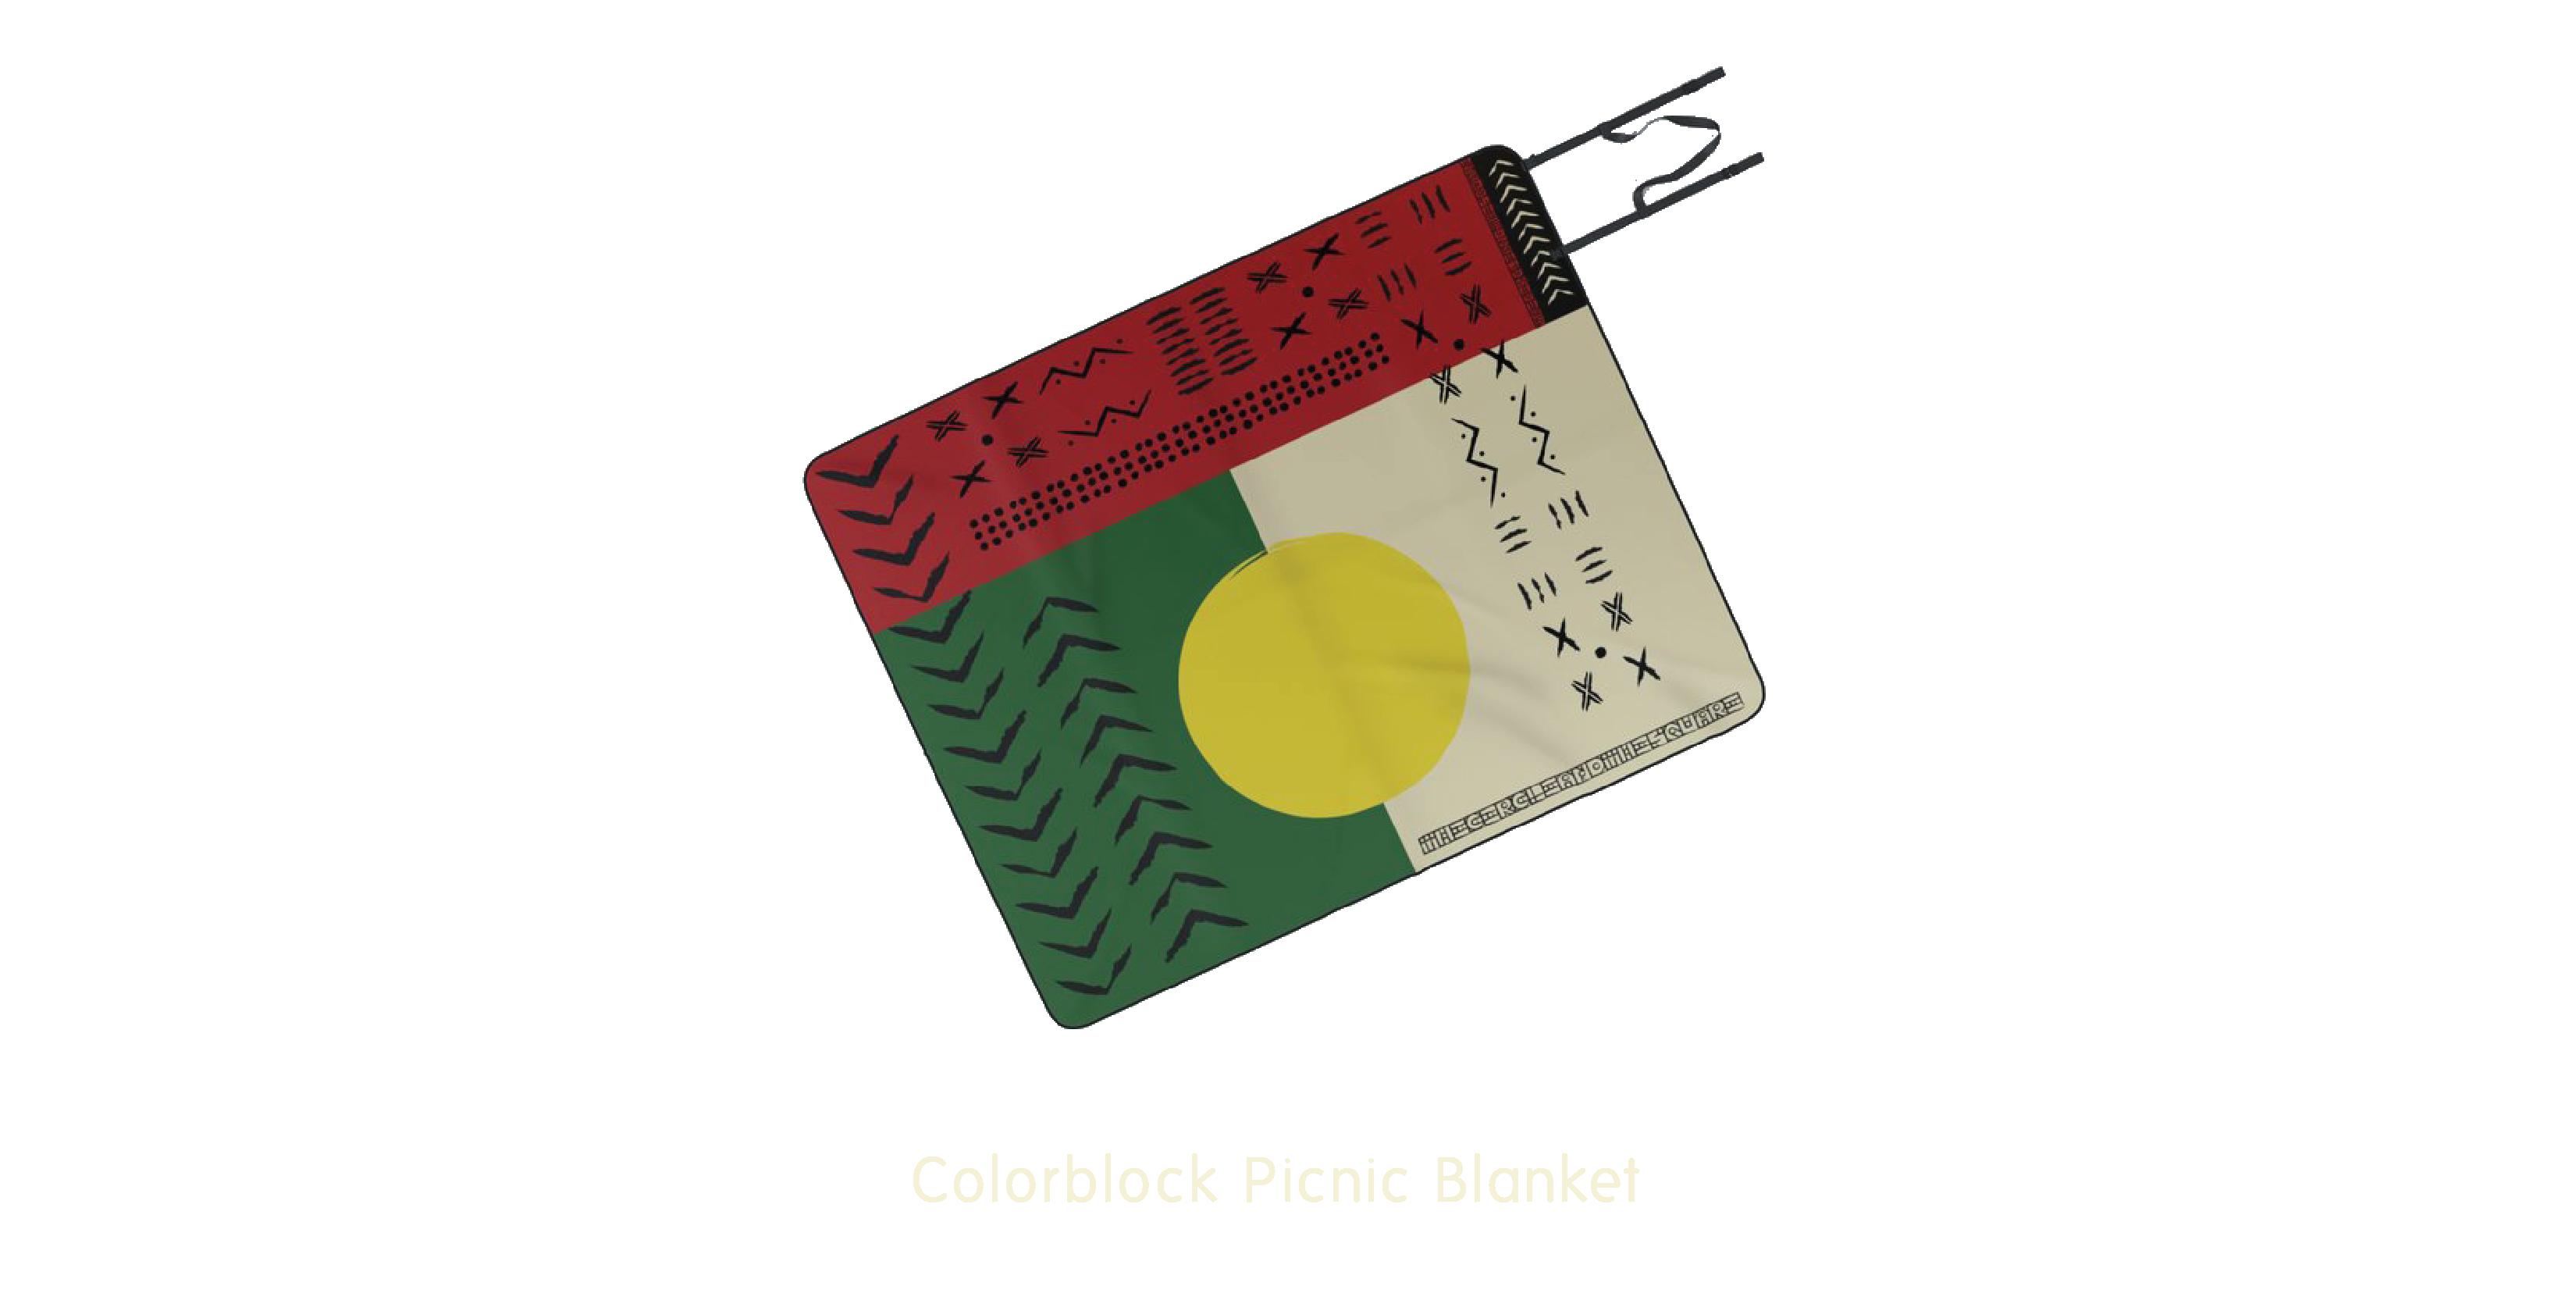 Colorblock Picnic Blanket